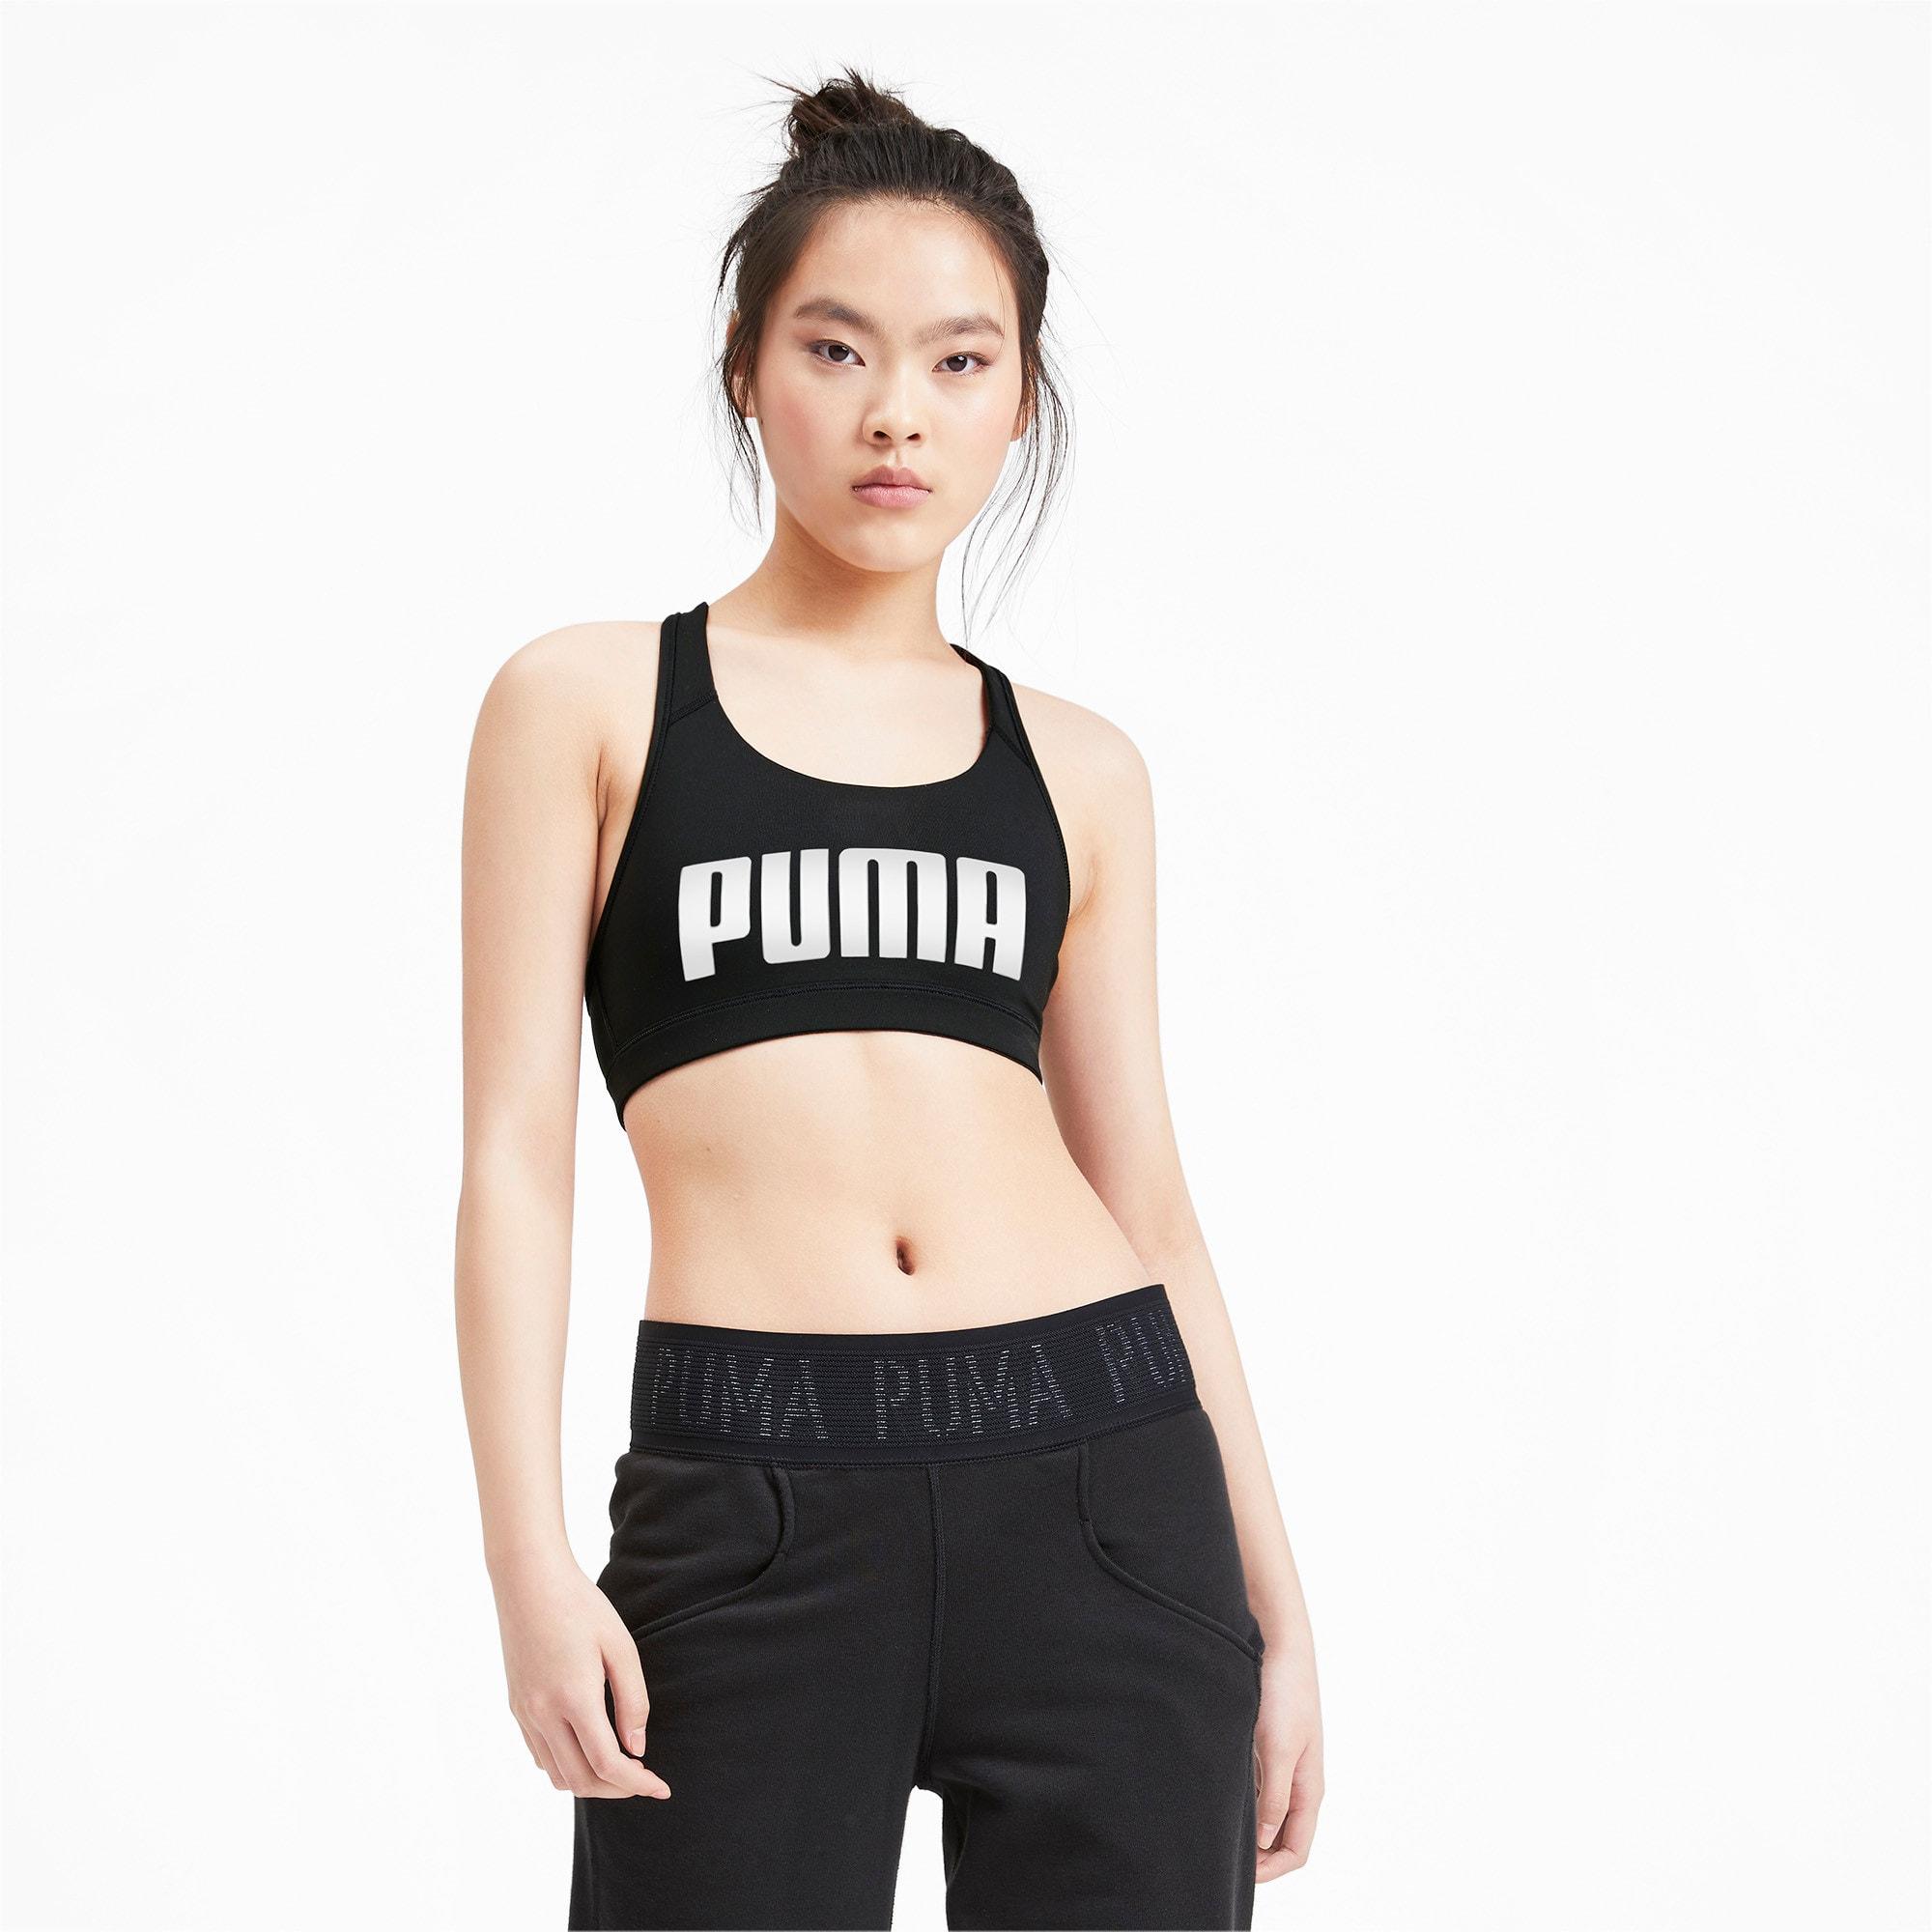 Thumbnail 1 of 4Keeps Mid Impact Women's Bra Top, Puma Black-Puma White, medium